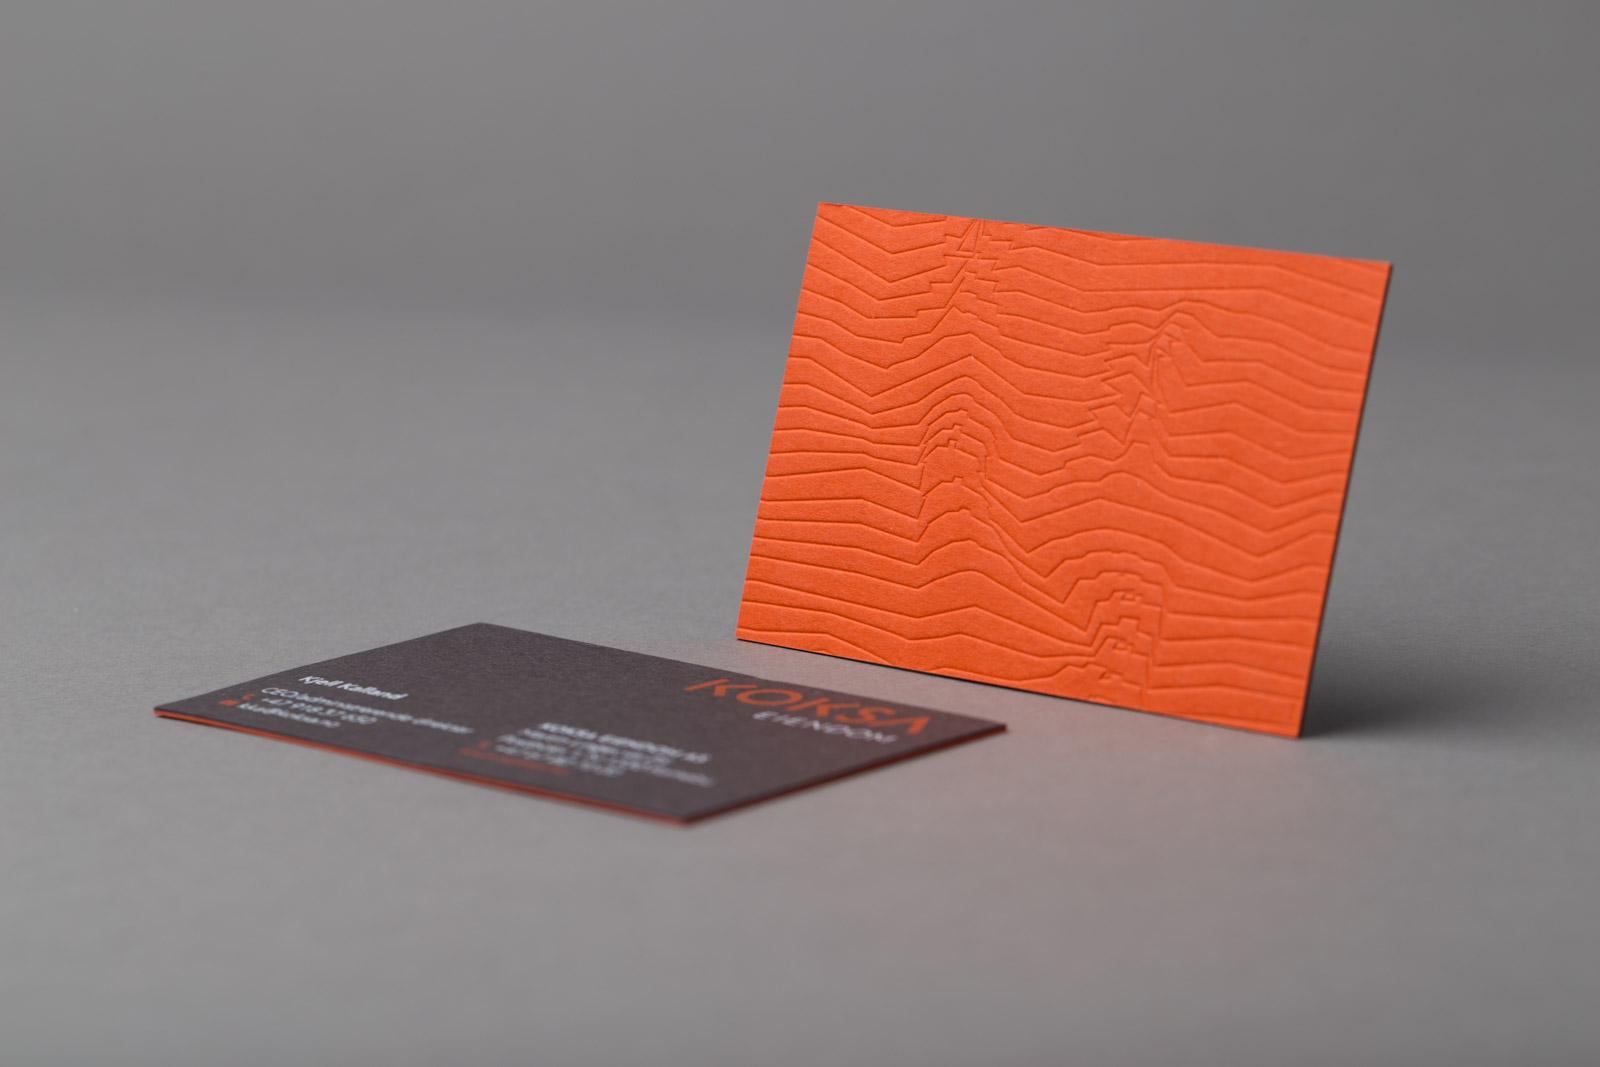 Visittkort med to ulike papirtyper